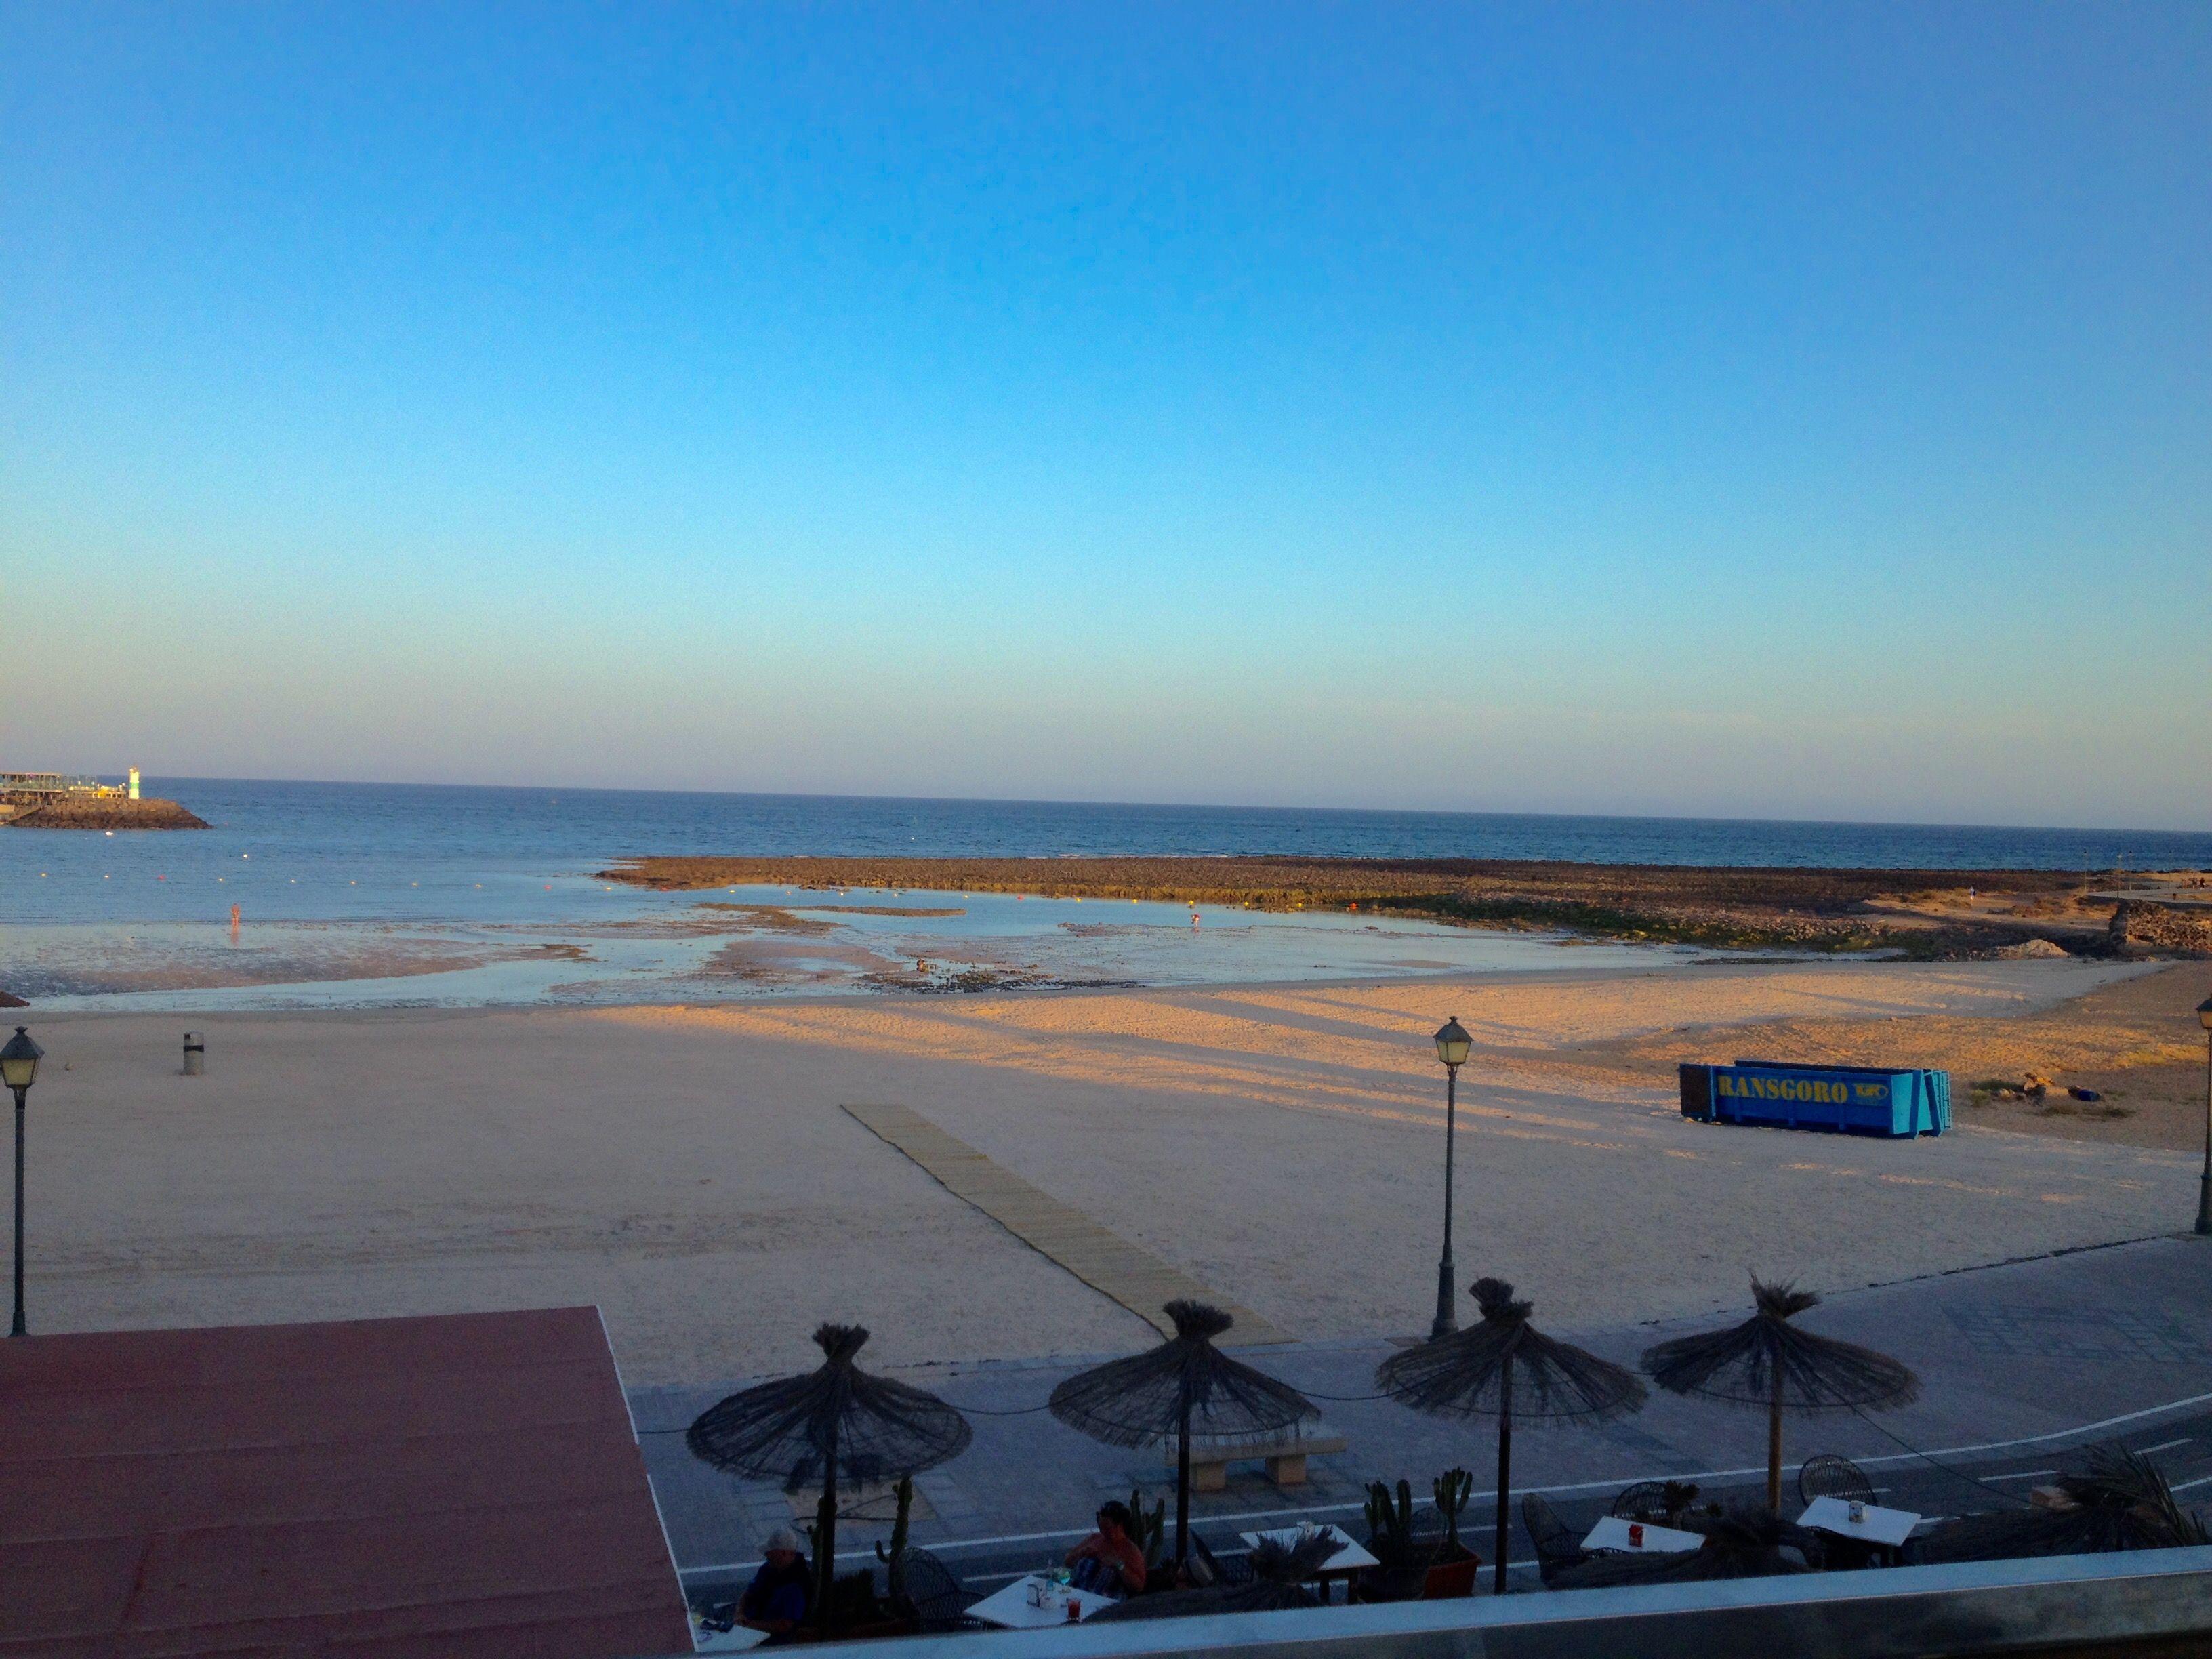 Playa de Caleta de Fuste al atardecer